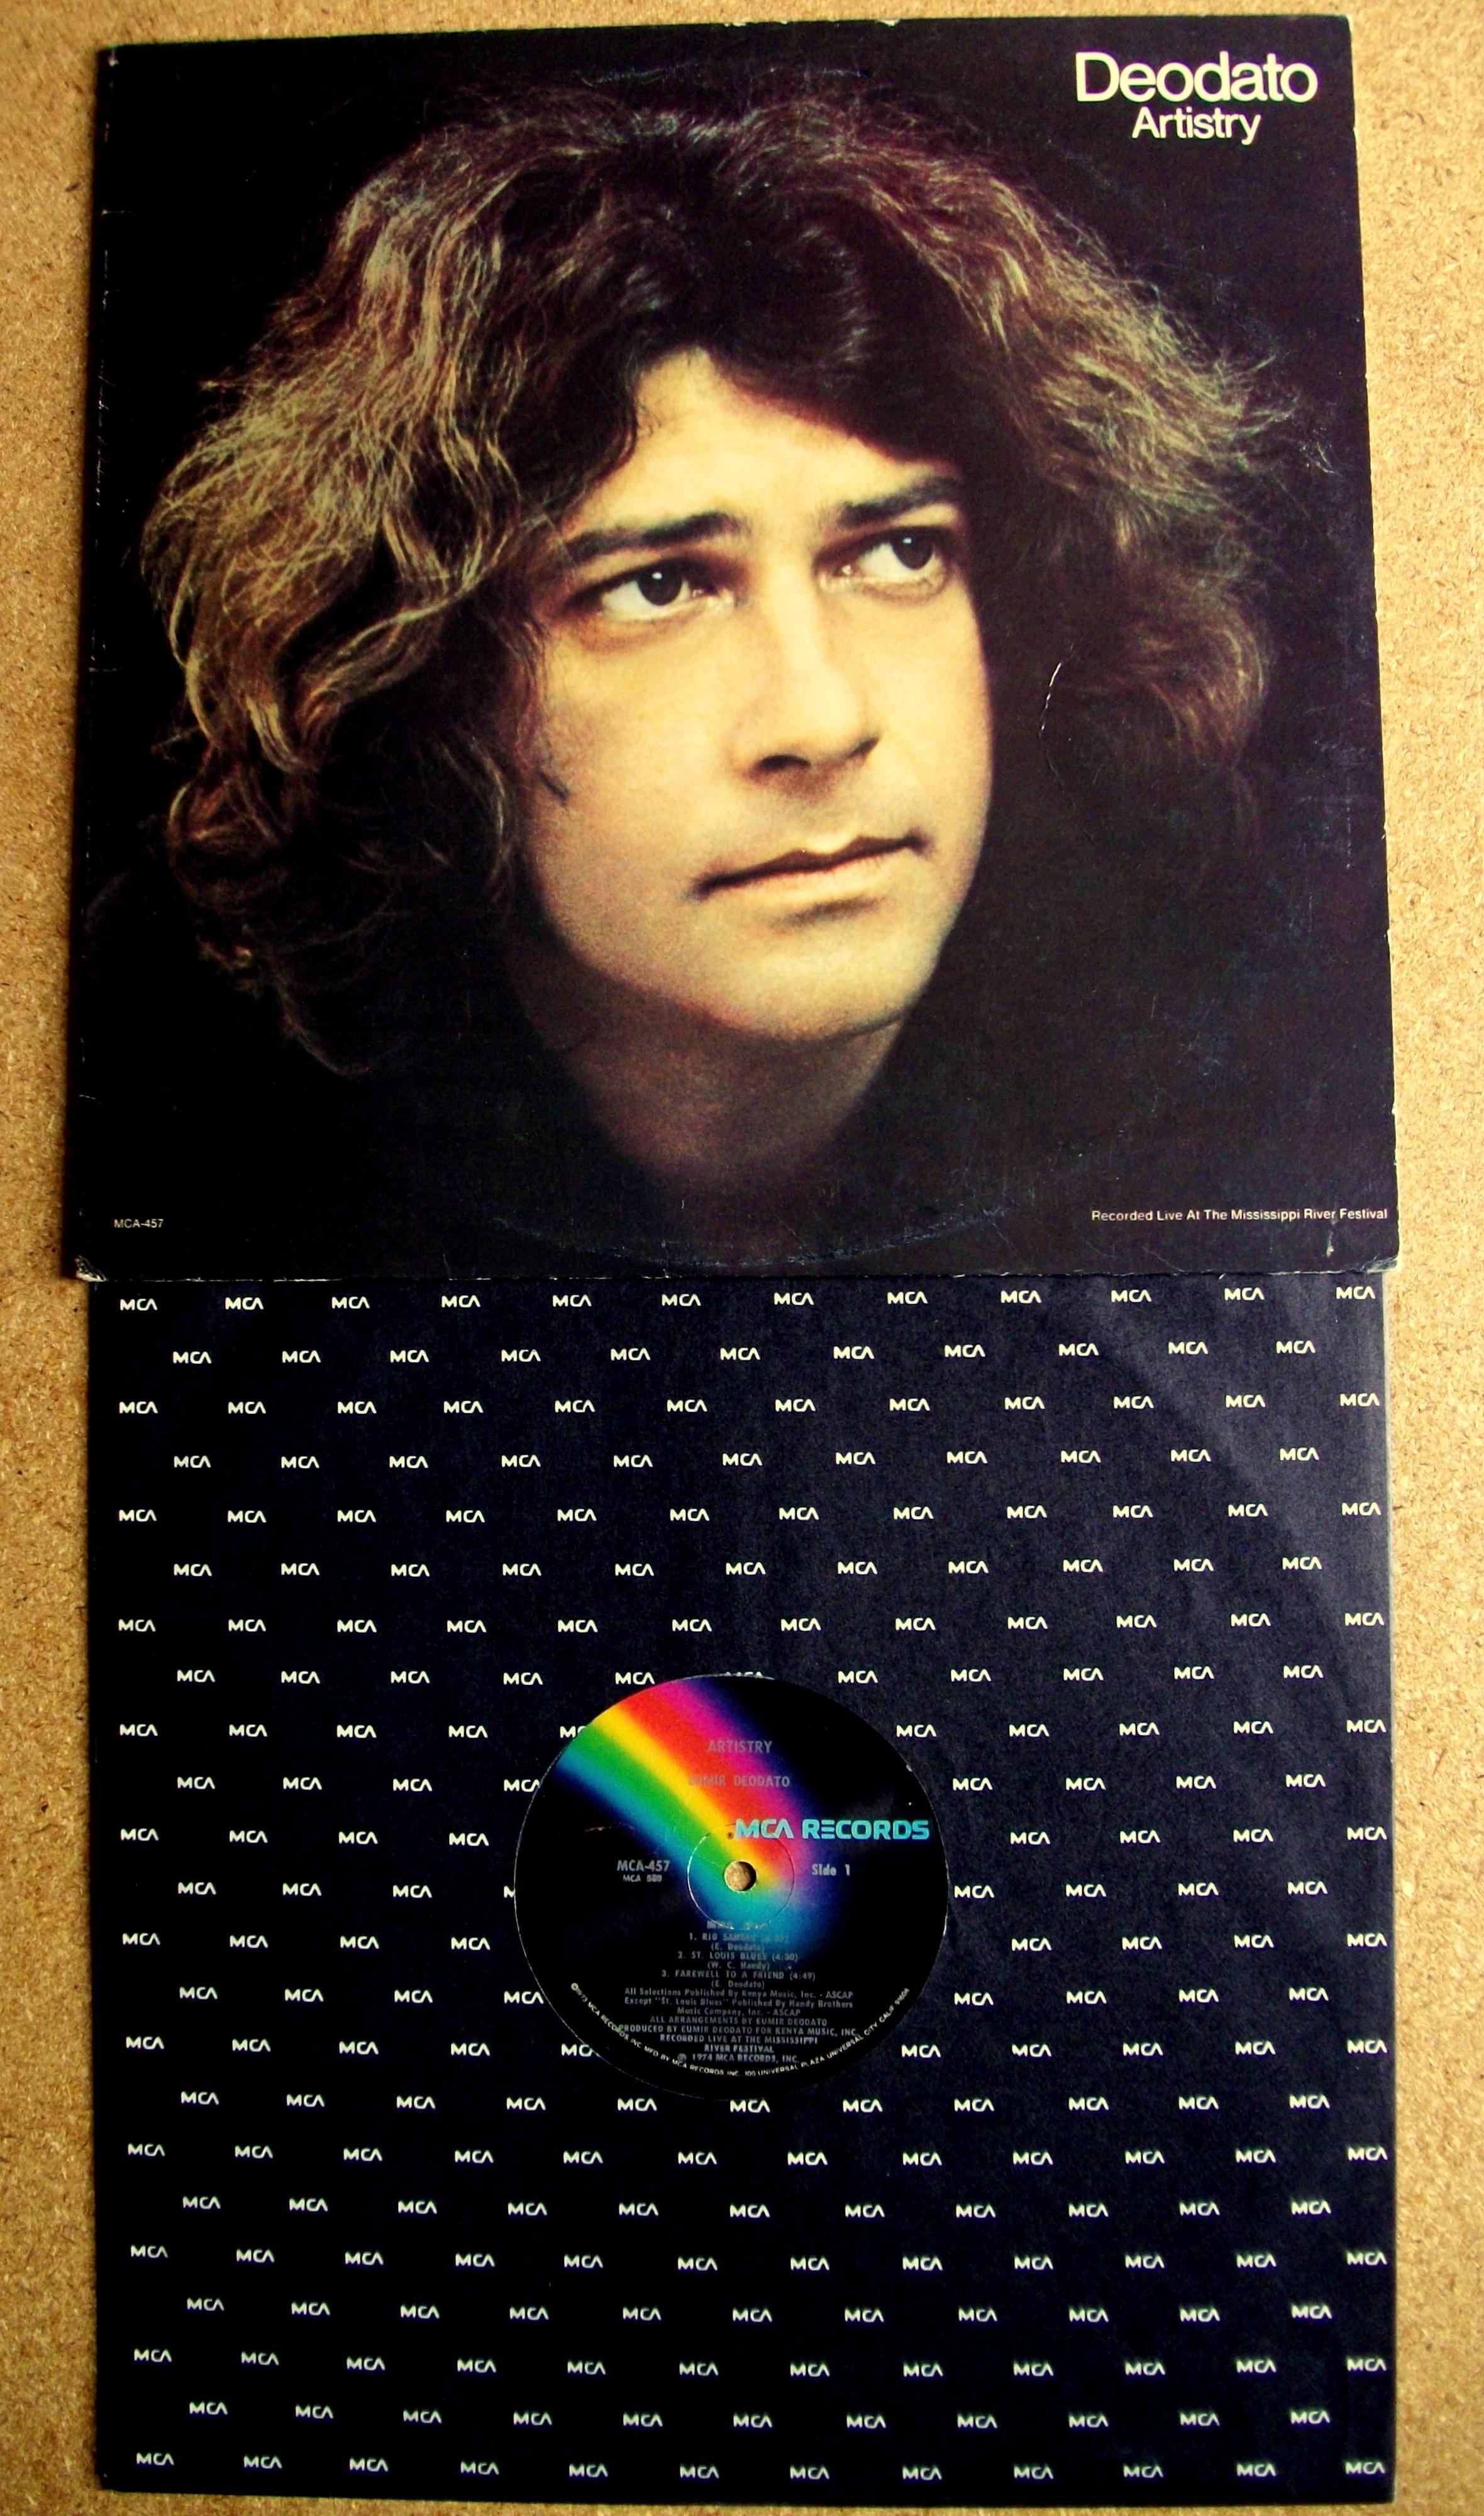 Sinister Vinyl Collection Eumir Deodato Artistry 1974